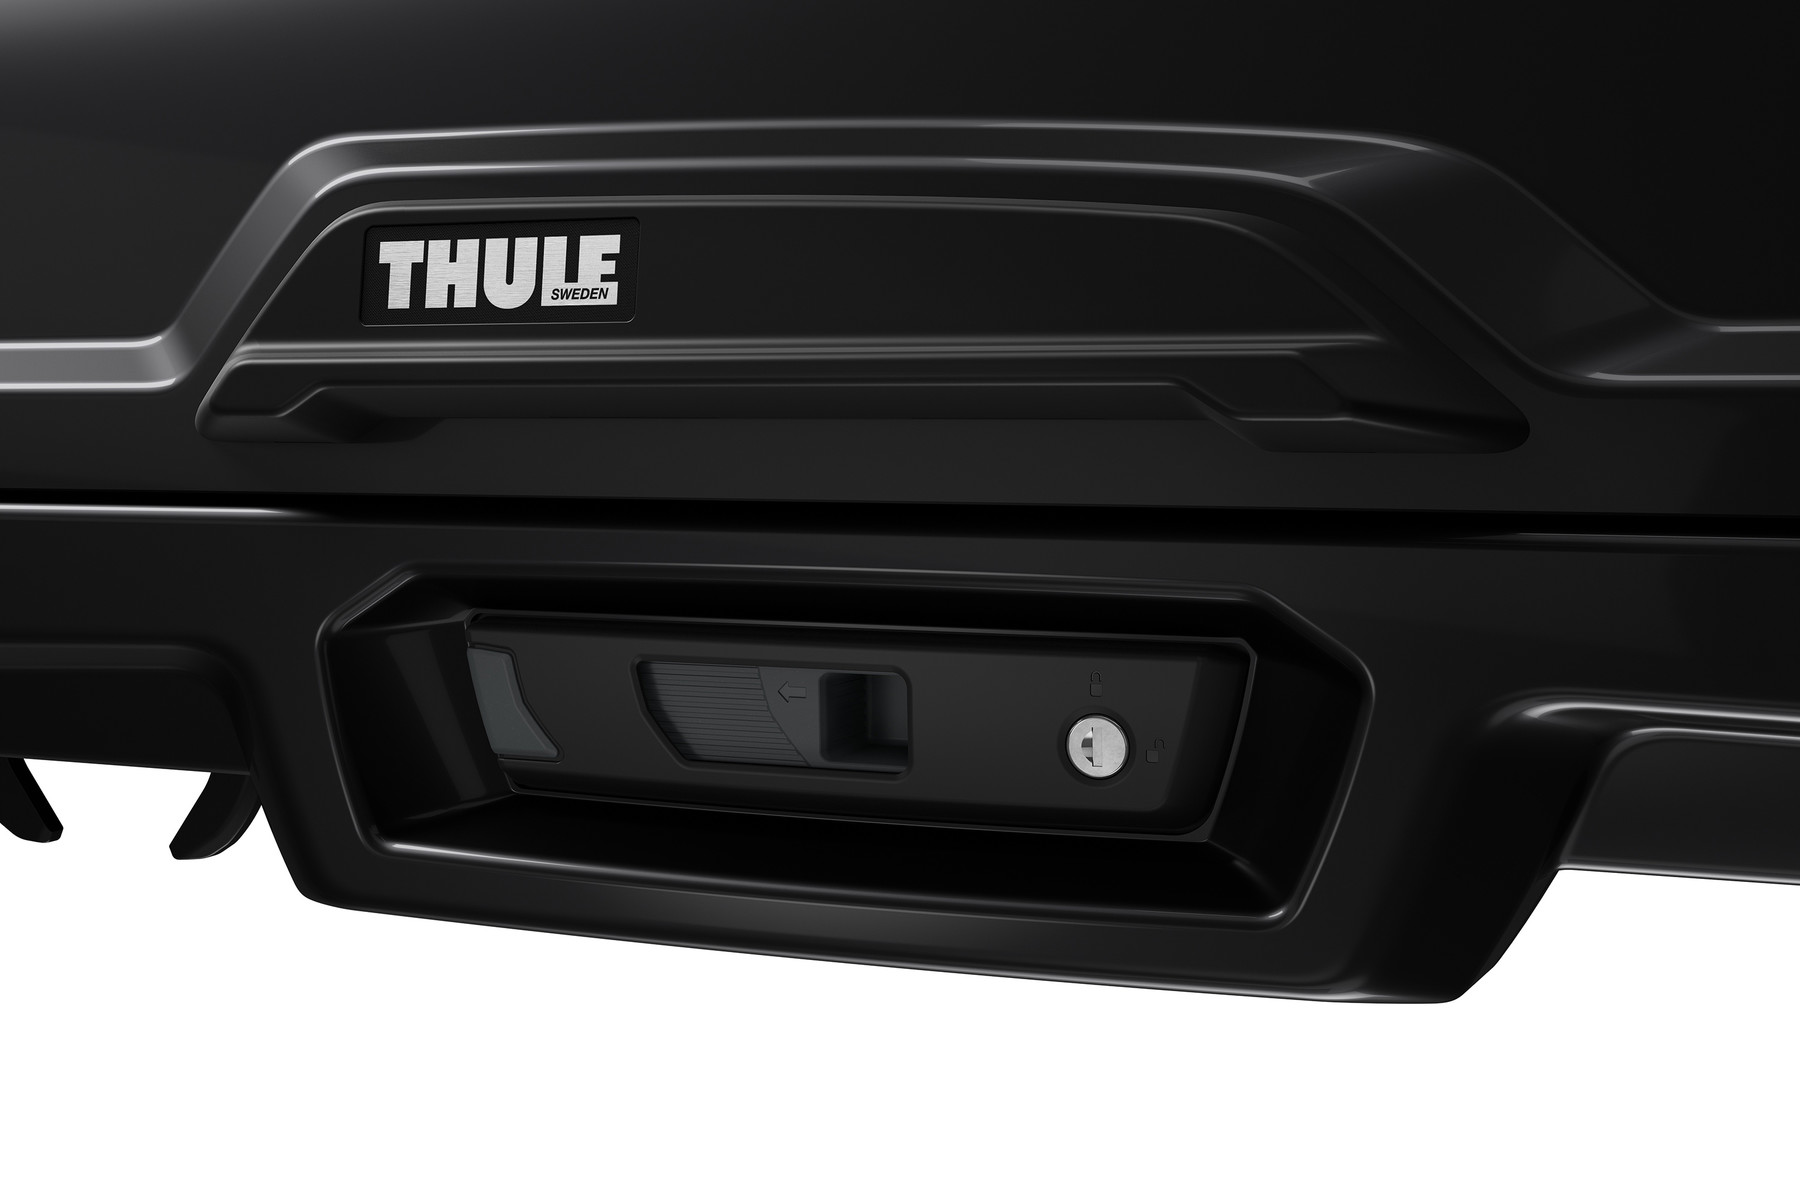 thule_vector_desc_3